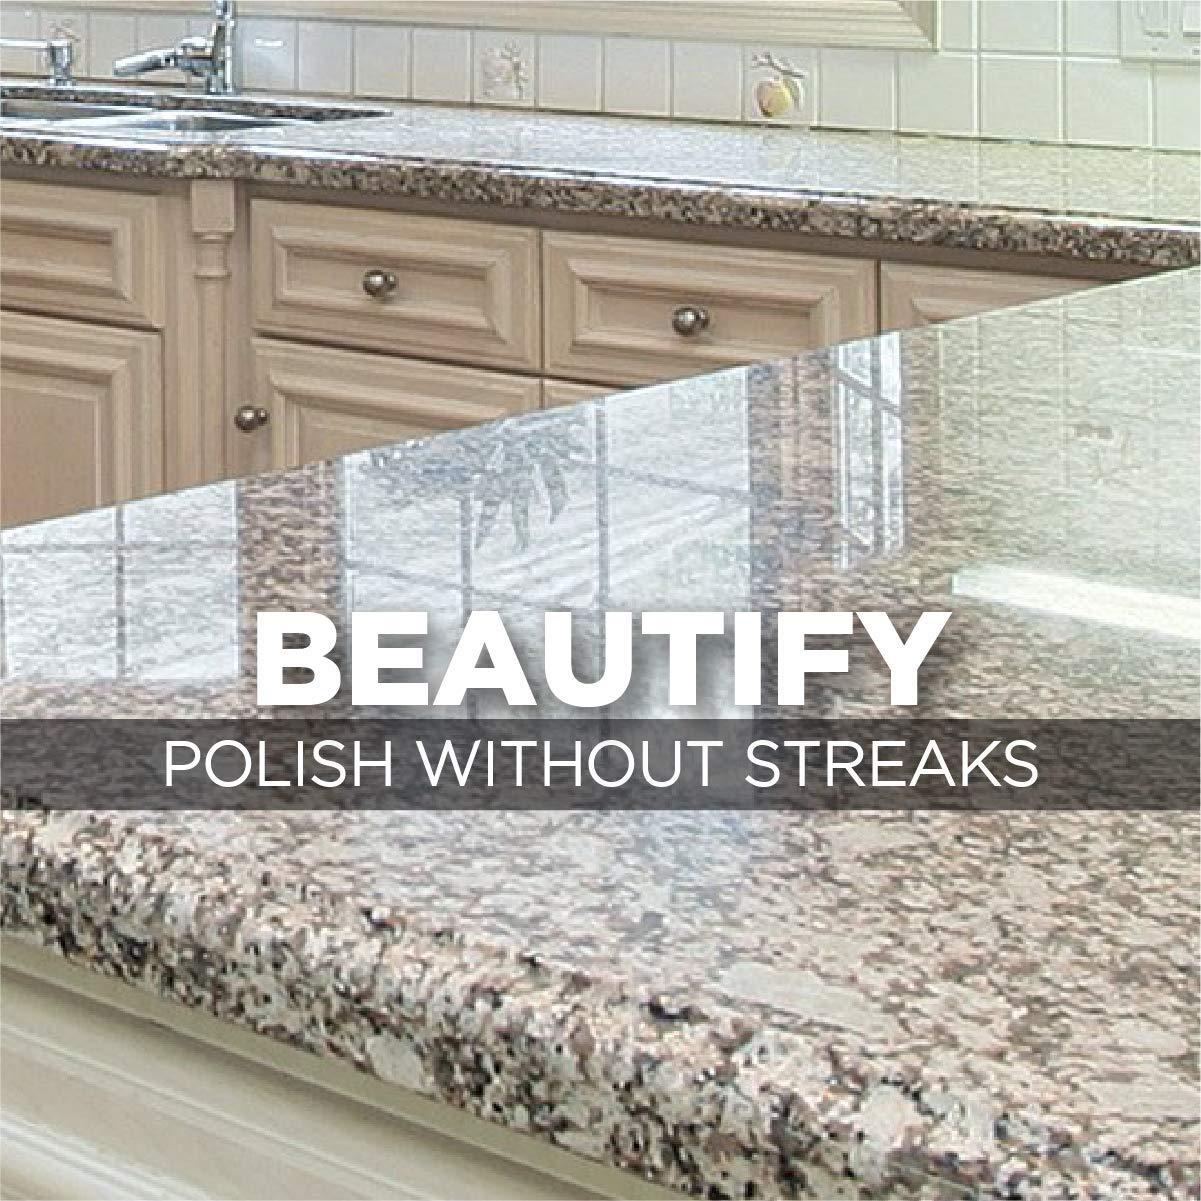 Weiman Granite Cleaner and Polish - 17 Ounce - For Granite Marble Soapstone Quartz Quartzite Slate Limestone Corian Laminate Tile Countertop and More